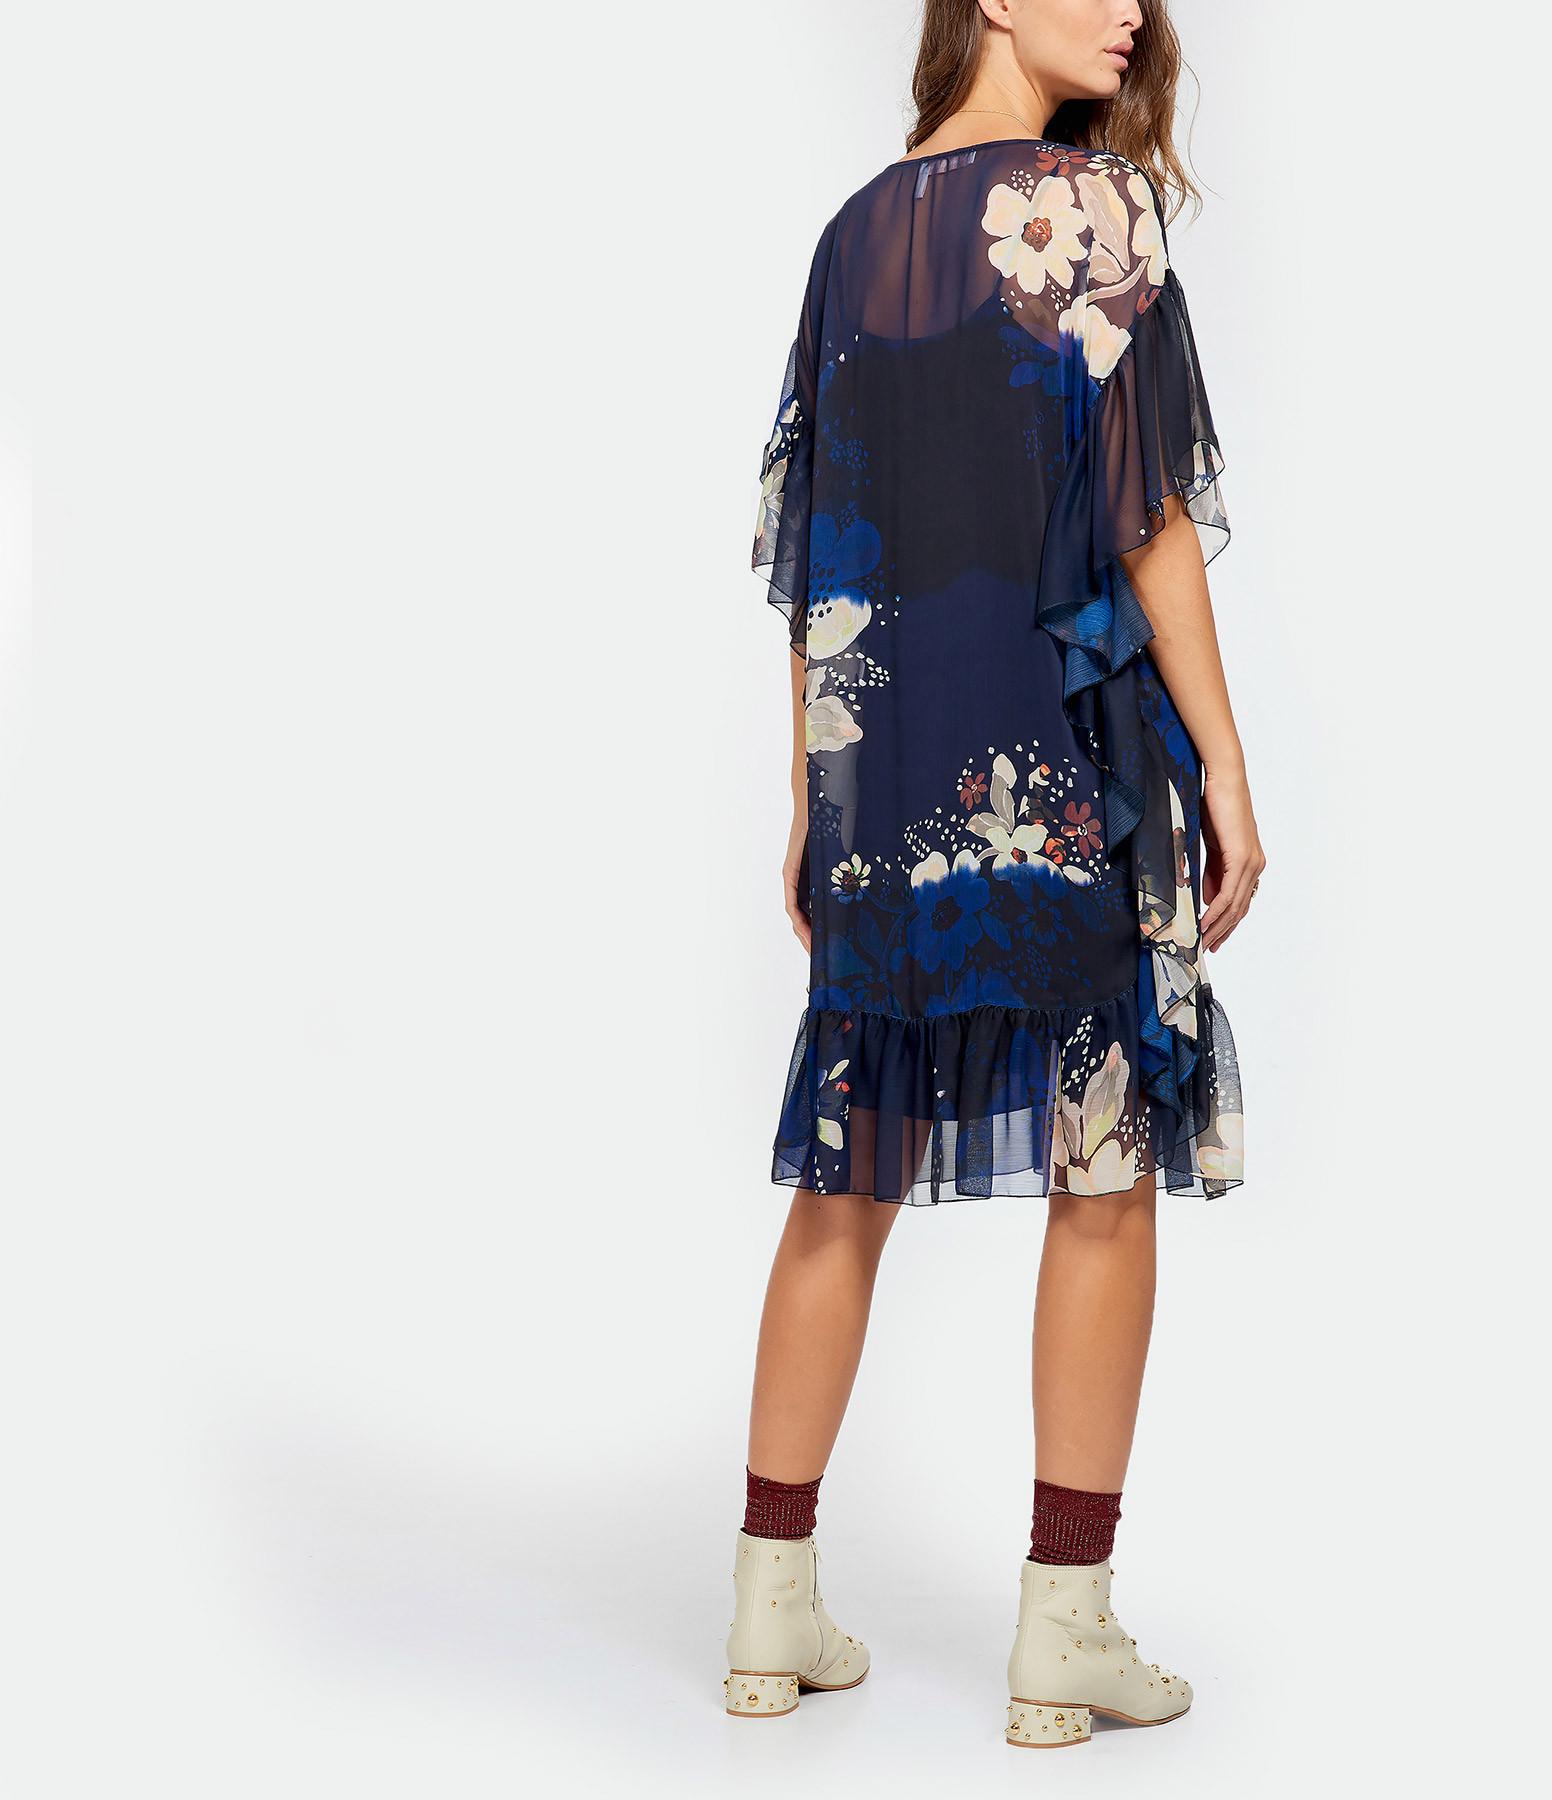 SEE BY CHLOE - Robe Imprimé Floral Bleu